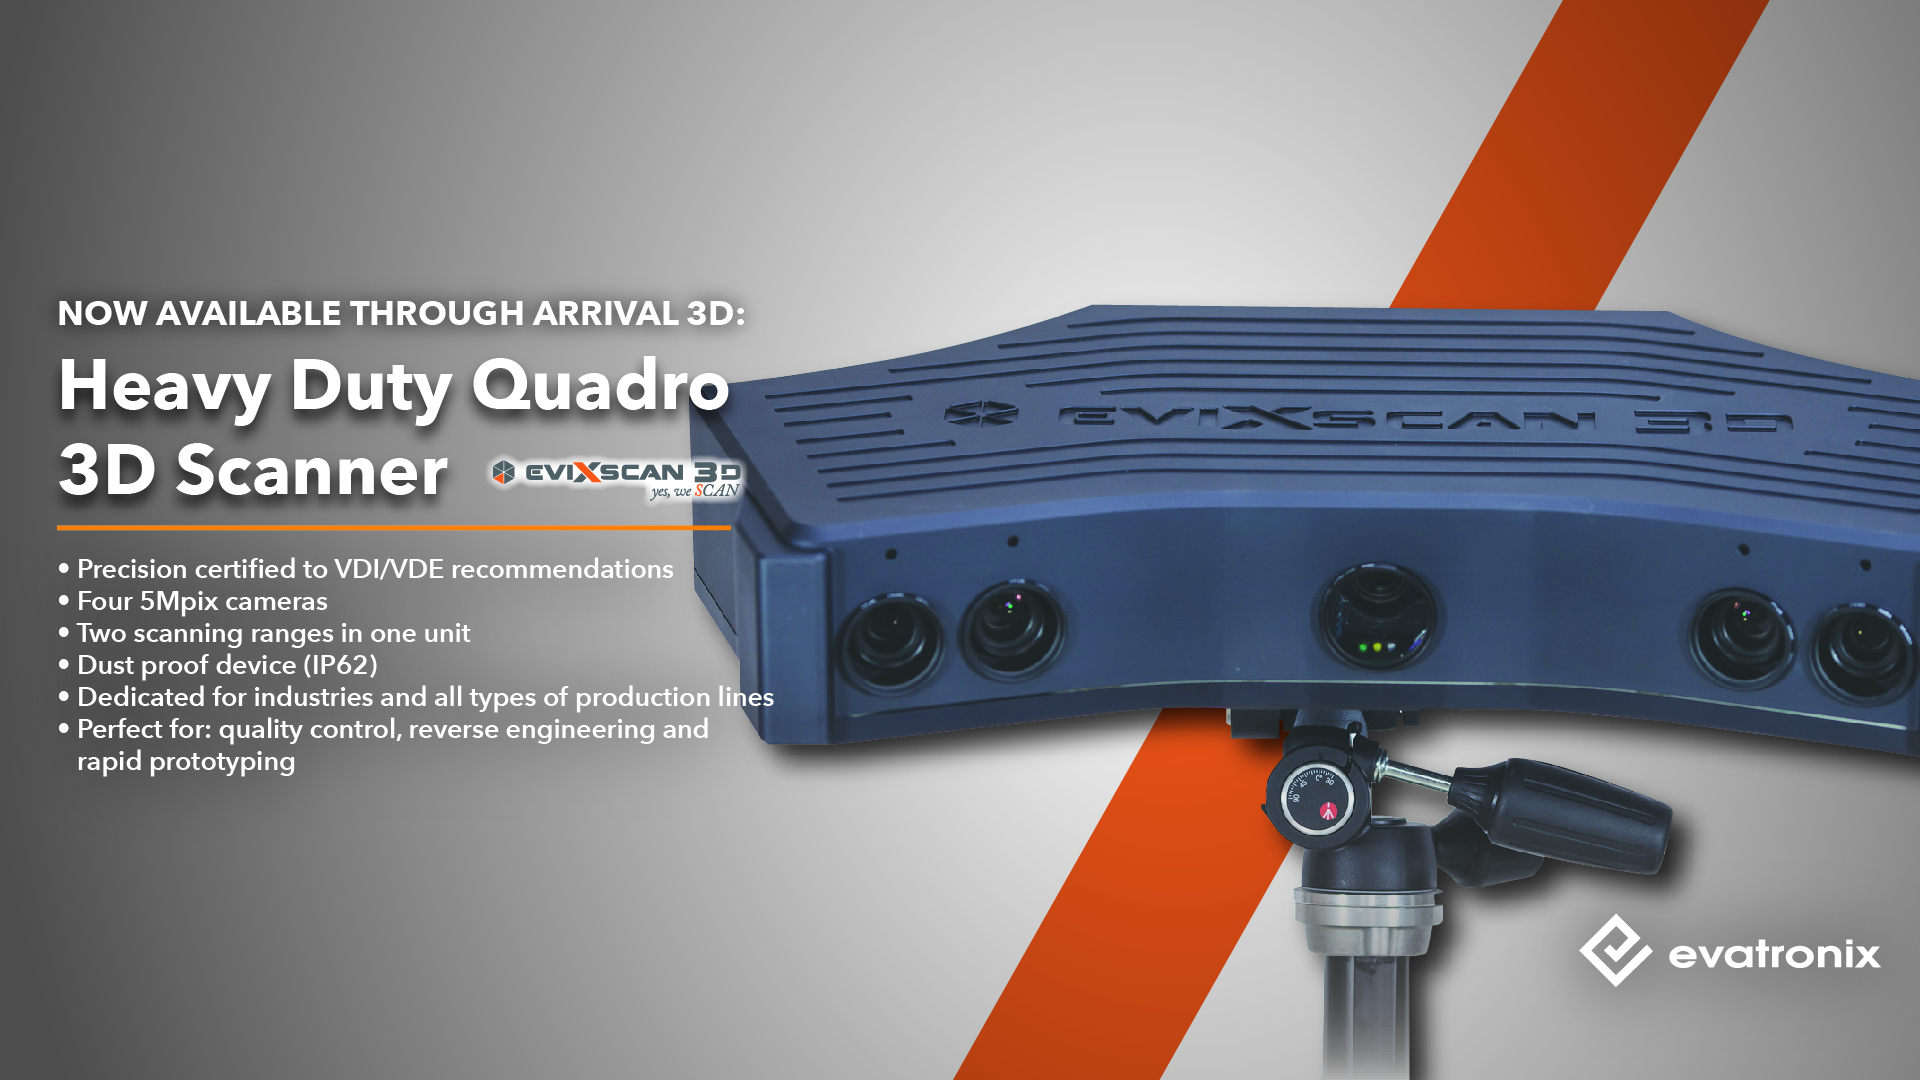 Heavy Duty Quadro scanner